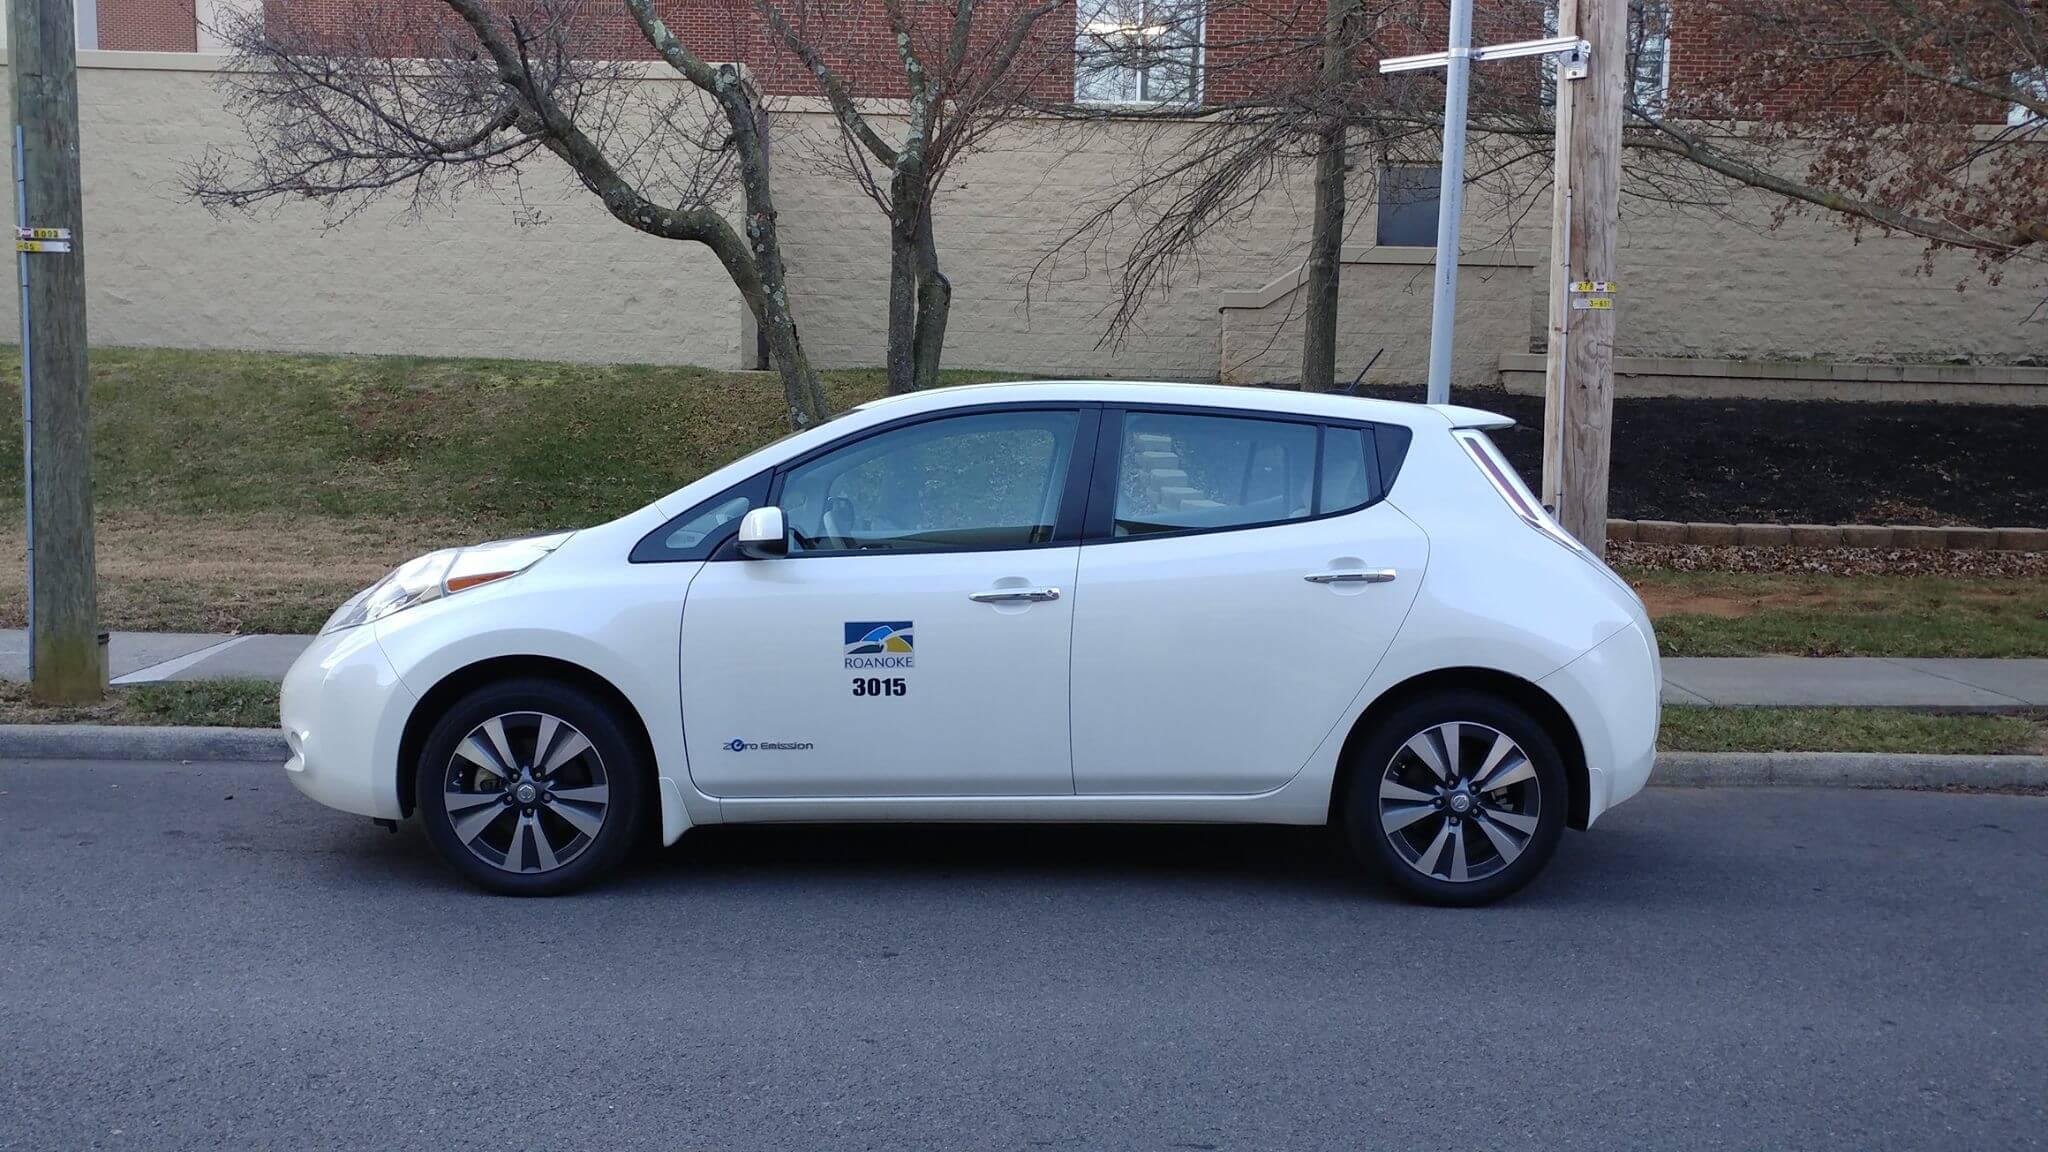 Roanoke Buys Electric Vehicles for City Fleet - NGT News